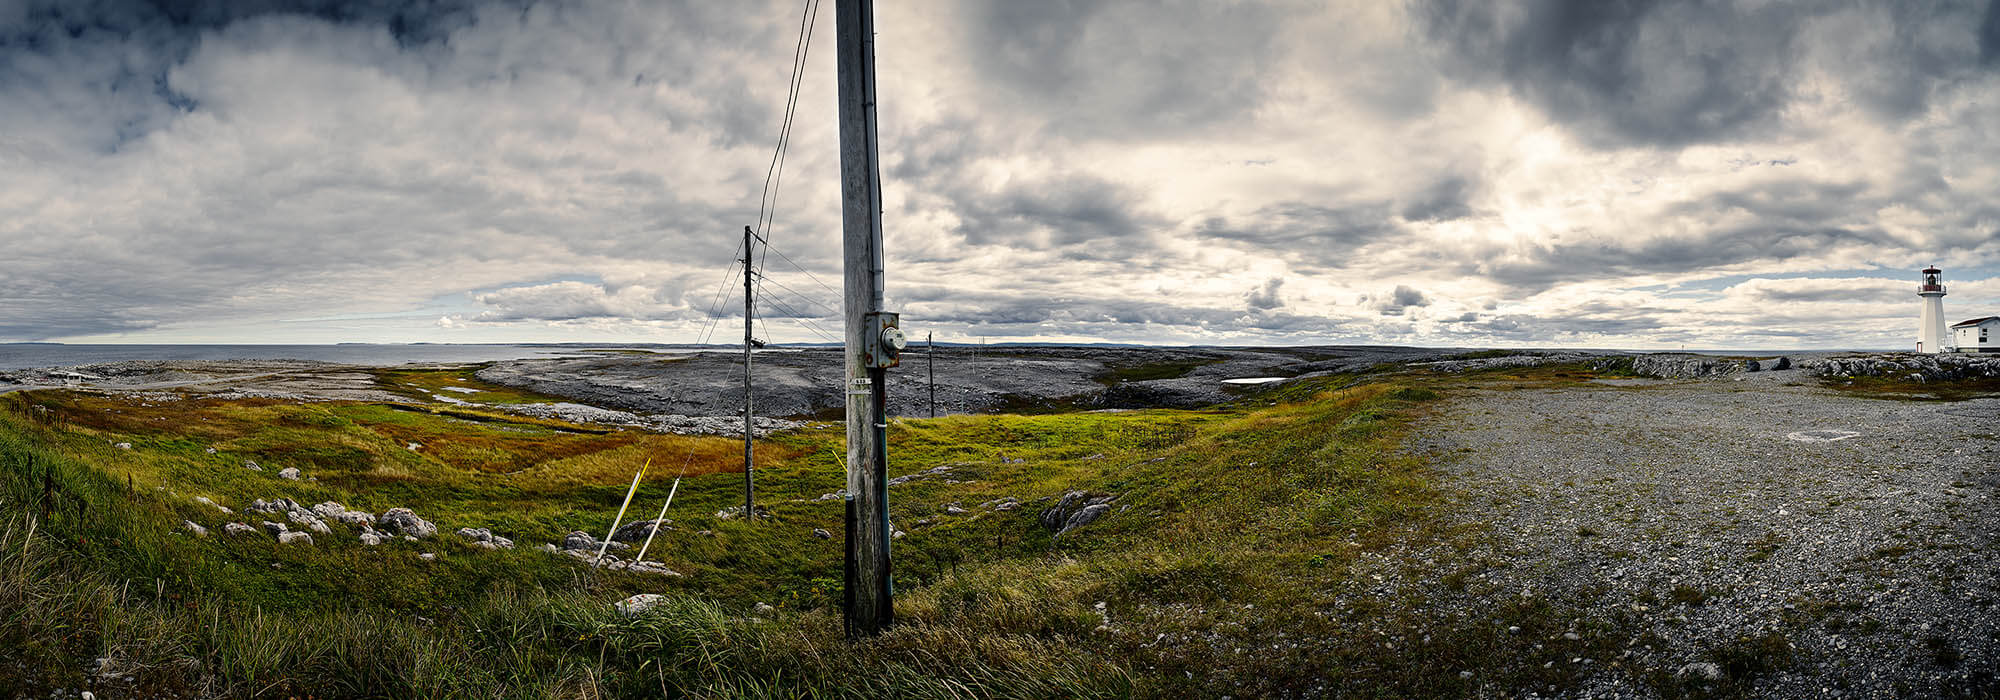 Lot#9<br />Cape Norman, Newfoundland, 2013 ~ Matthew Plexman